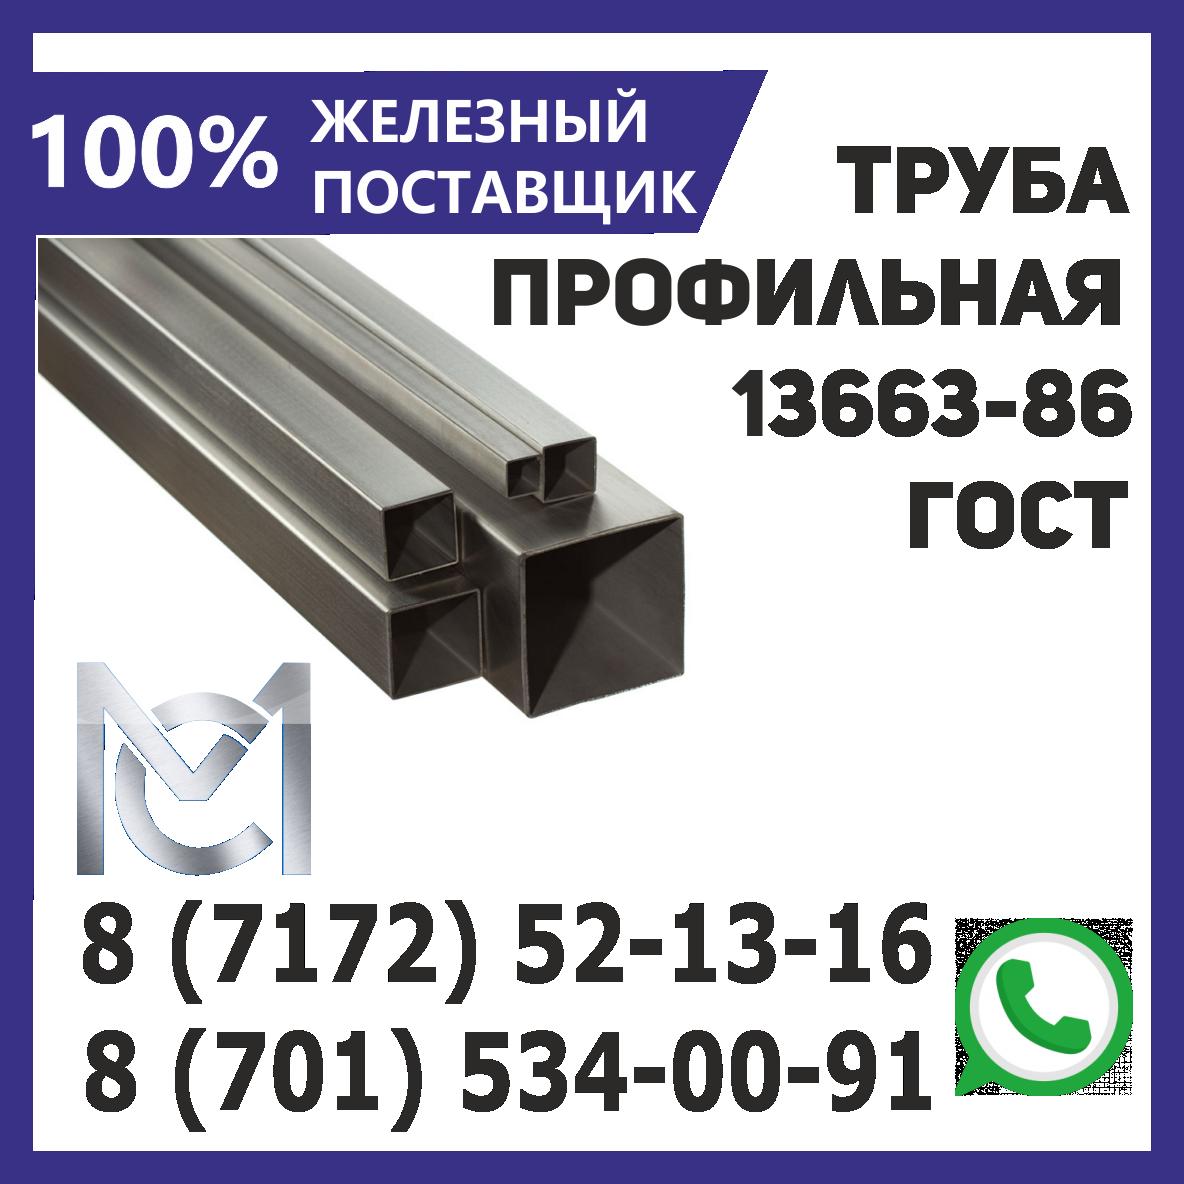 Труба профильная Д60х60 2мм ГОСТ 13663-86 стальная 6 метров